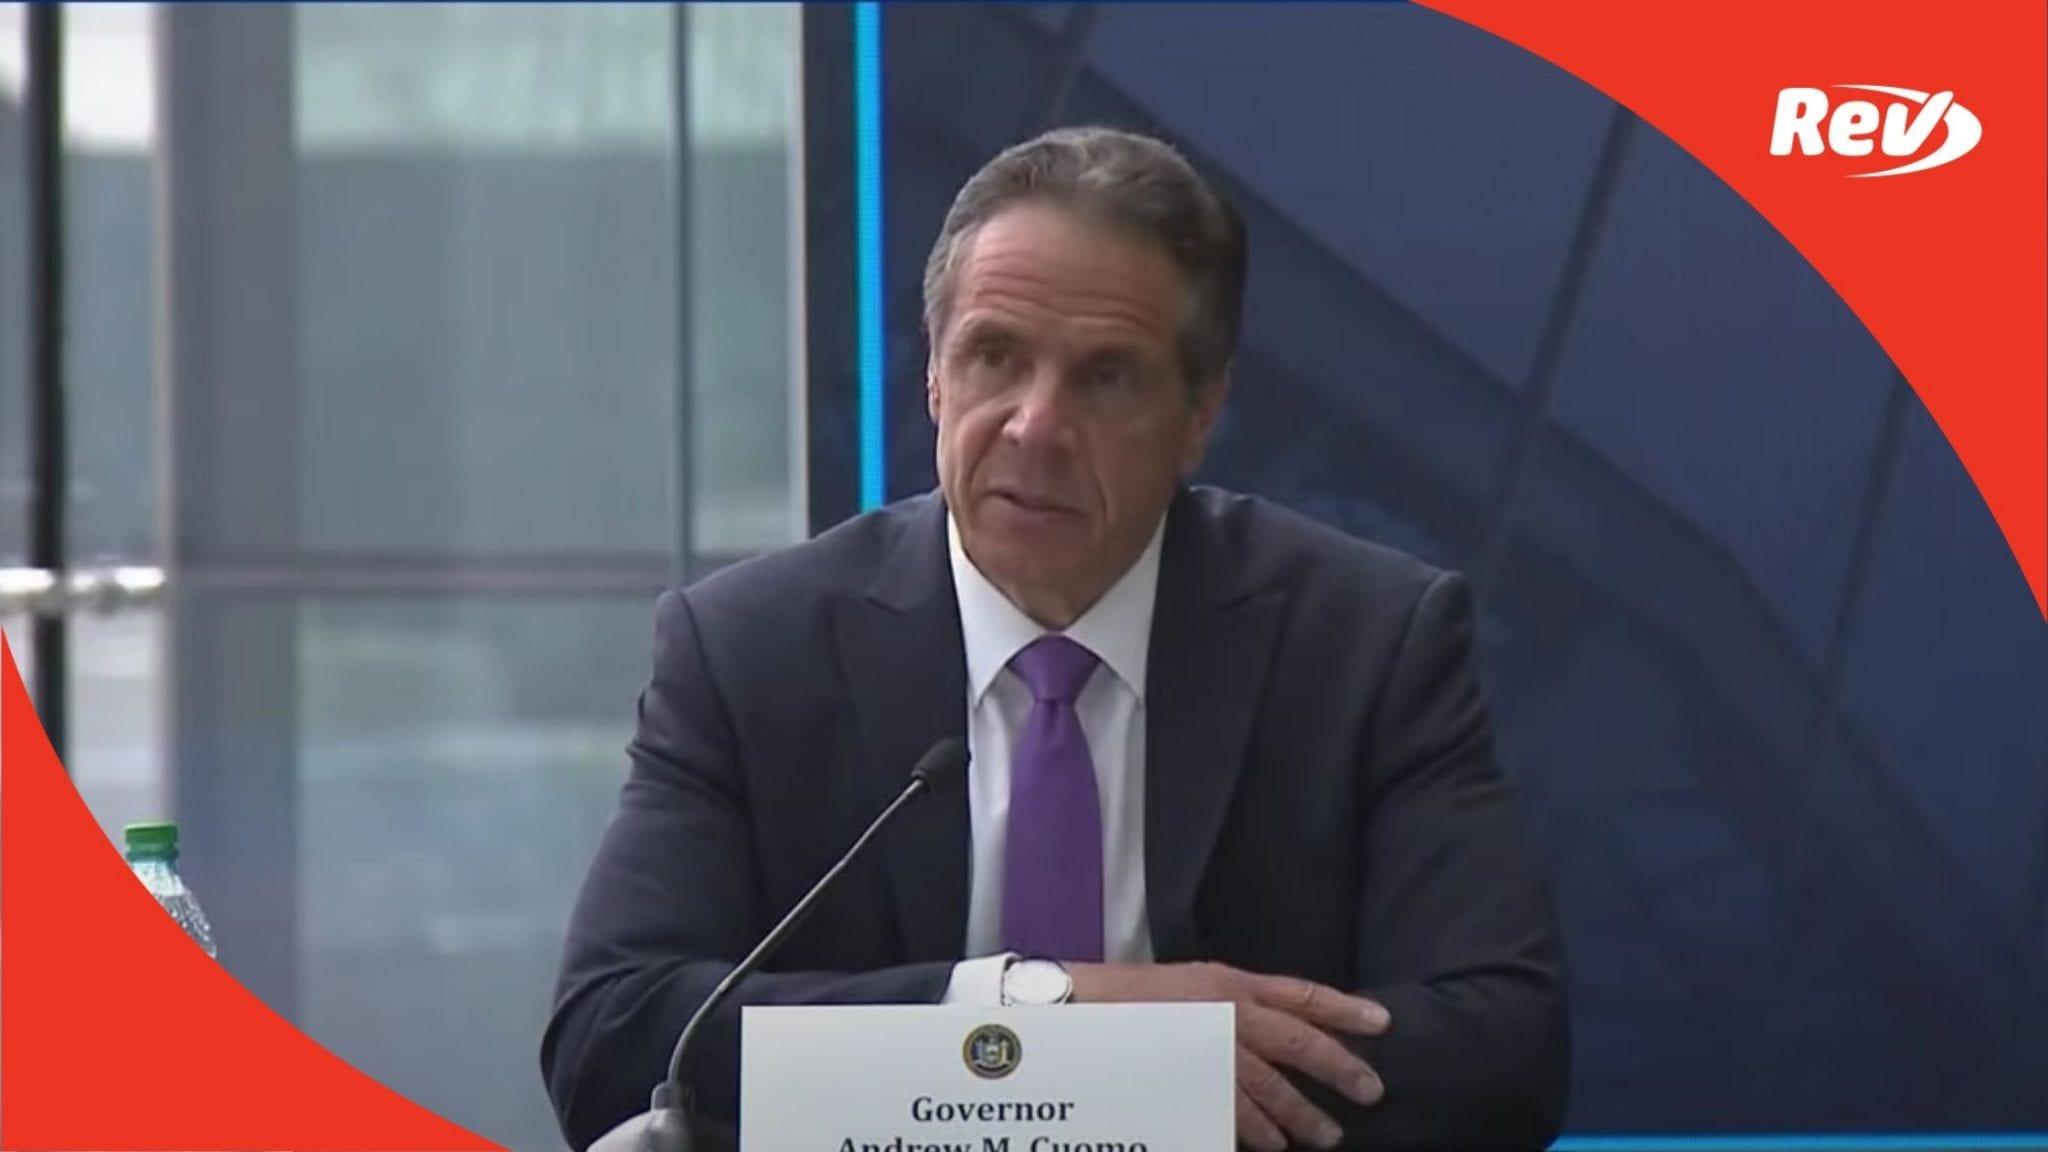 New York Gov. Andrew Cuomo COVID-19 Press Conference Transcript May 11